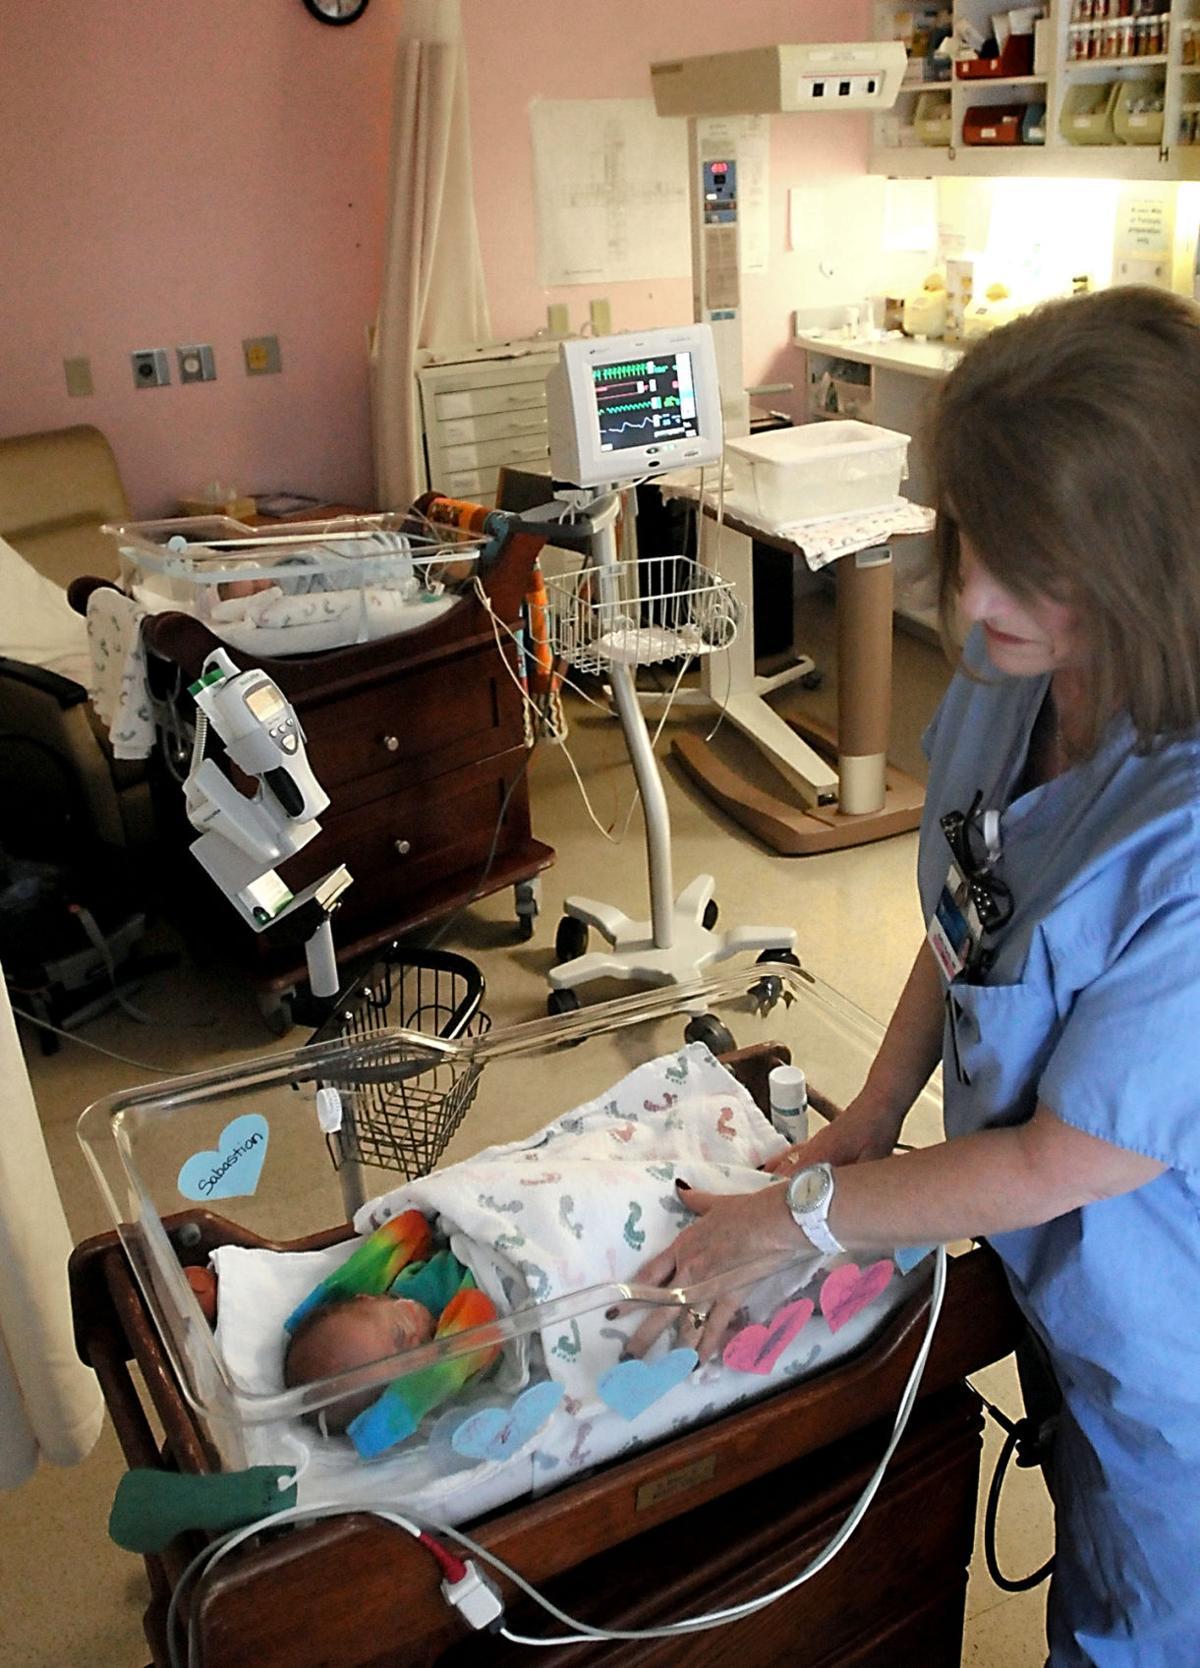 Mayo clinic nurse line rochester mn - Remodeling Mayo Neonatal Unit 1